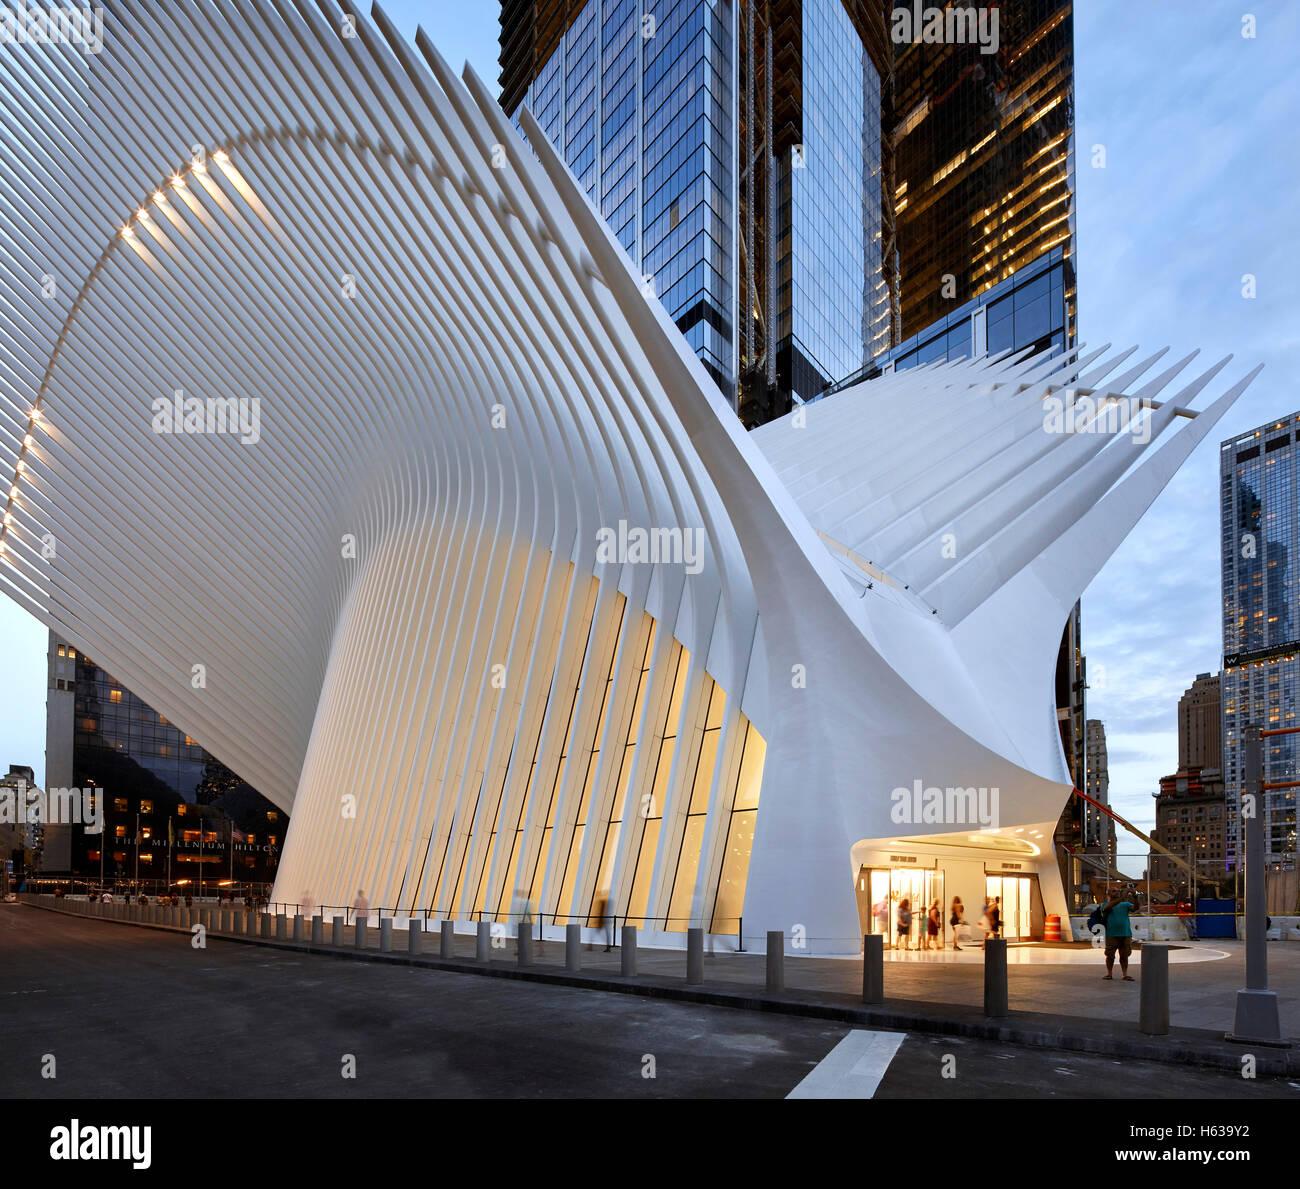 fc1d835e525c Illuminated street level entrance. The Oculus